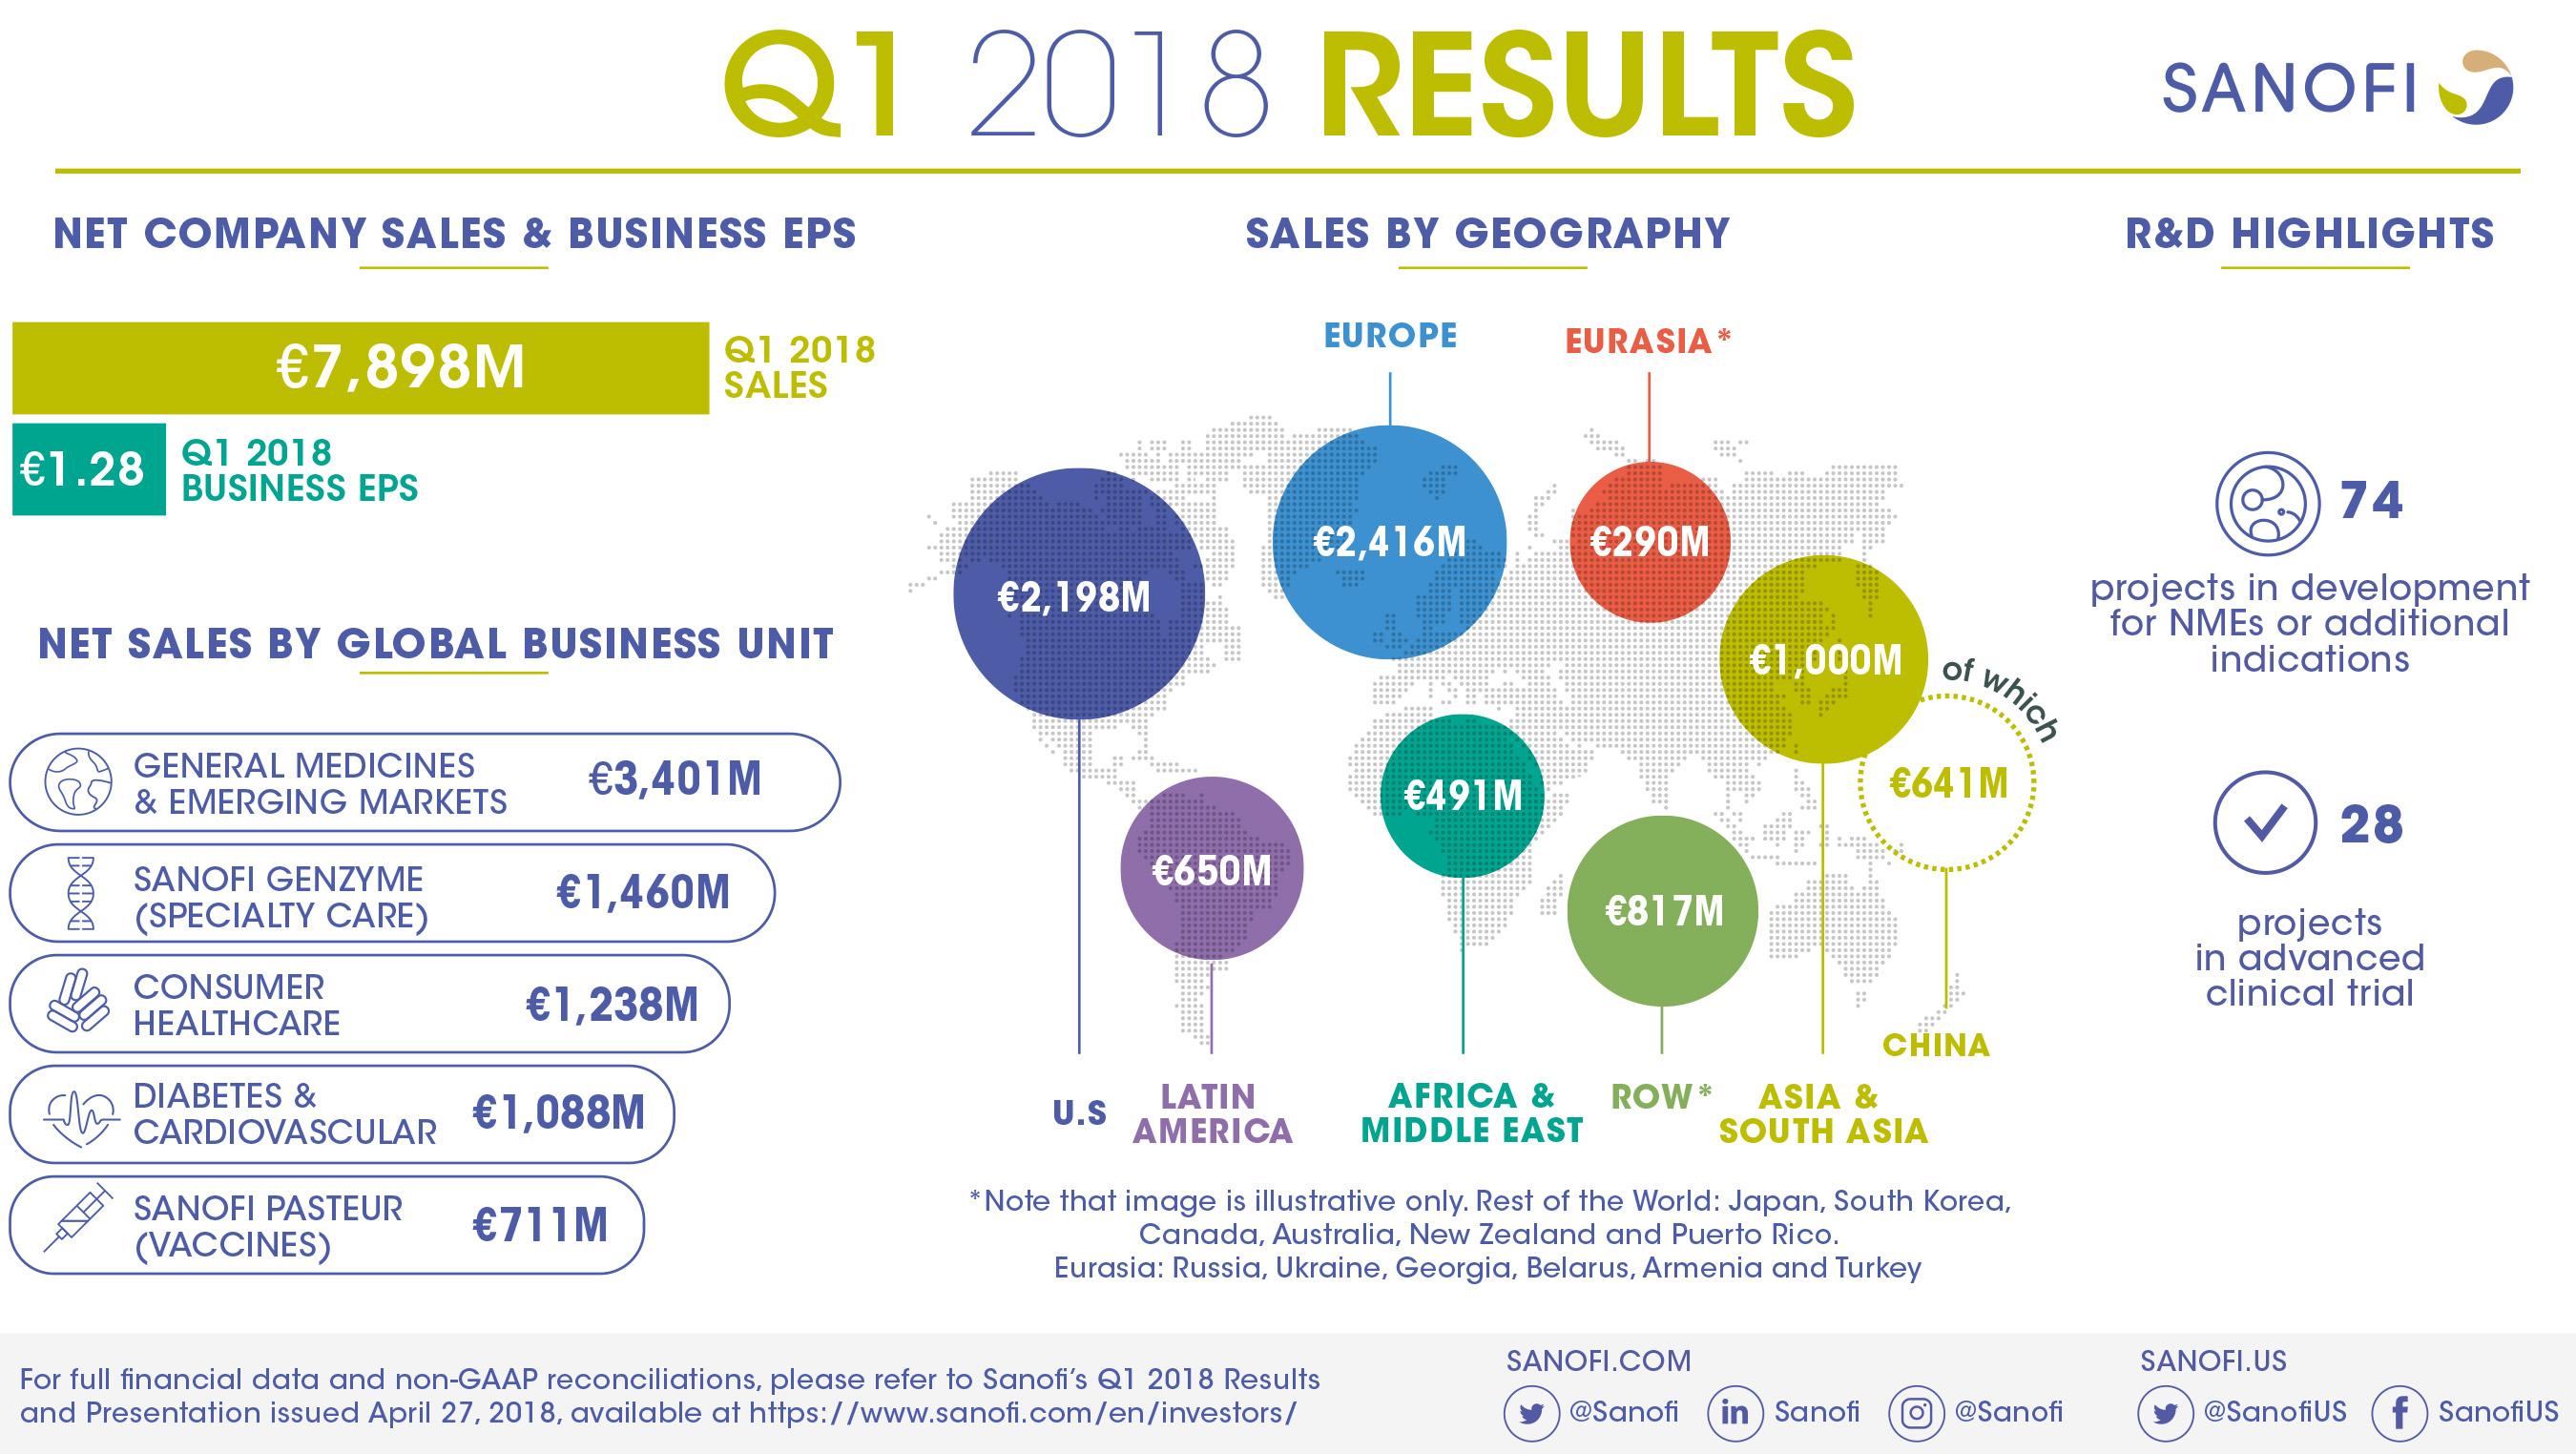 Sanofi Q1 2018 Results Infographic